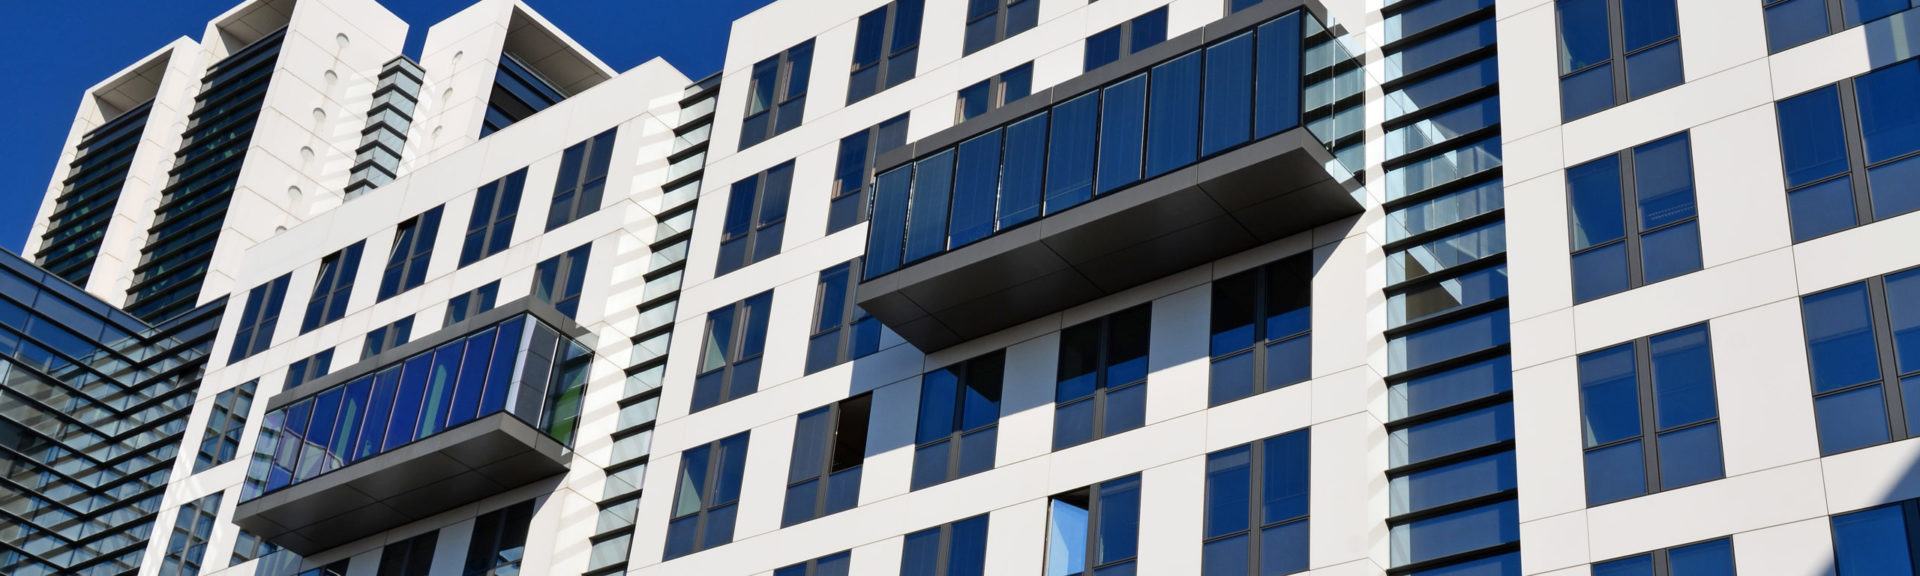 Immobilie - Hohes Bürogebäude